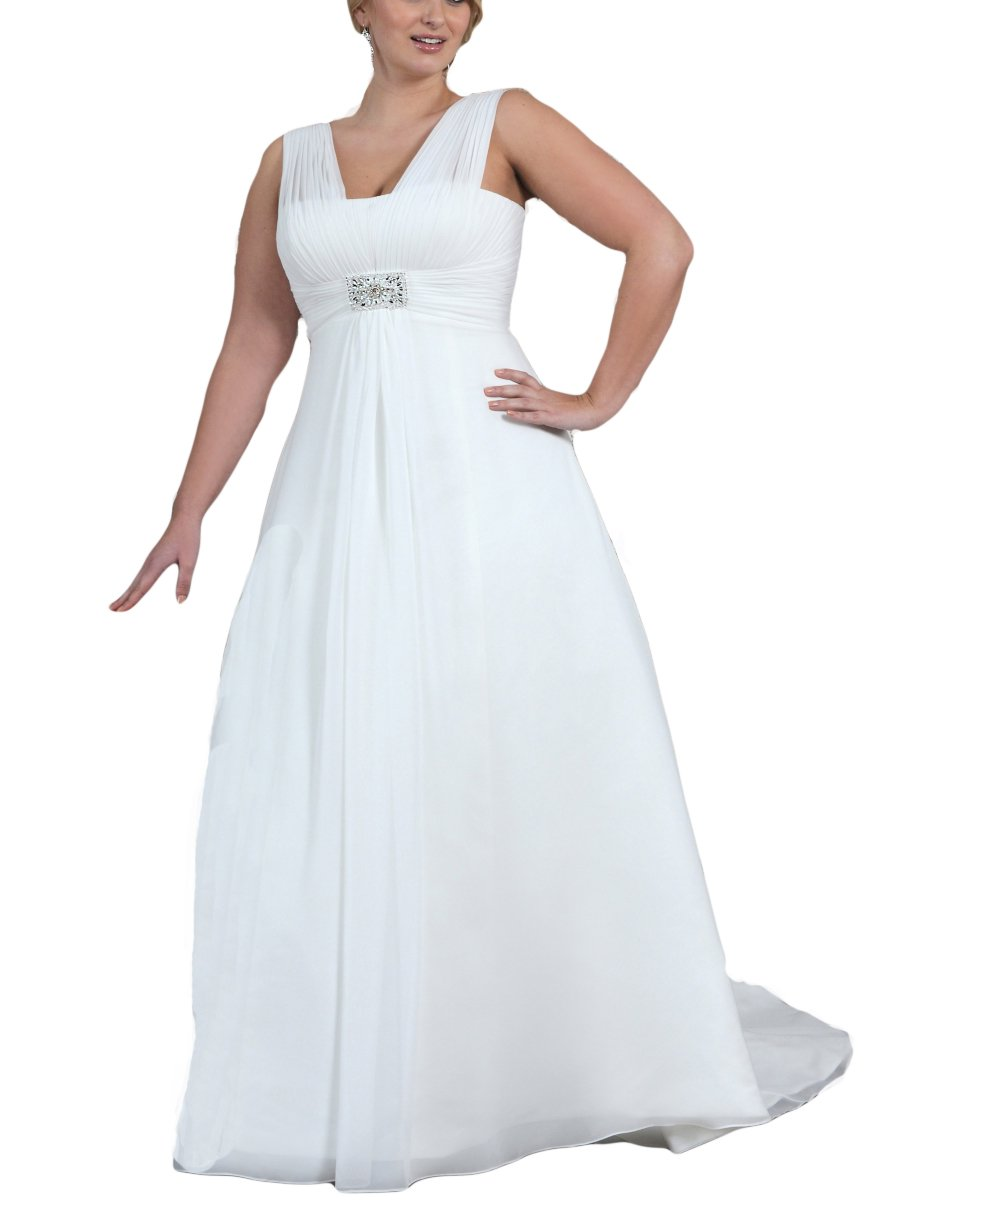 DreHouse Women\'s Empire Chiffon Beach Wedding Dress Bridal Gowns Plus Size